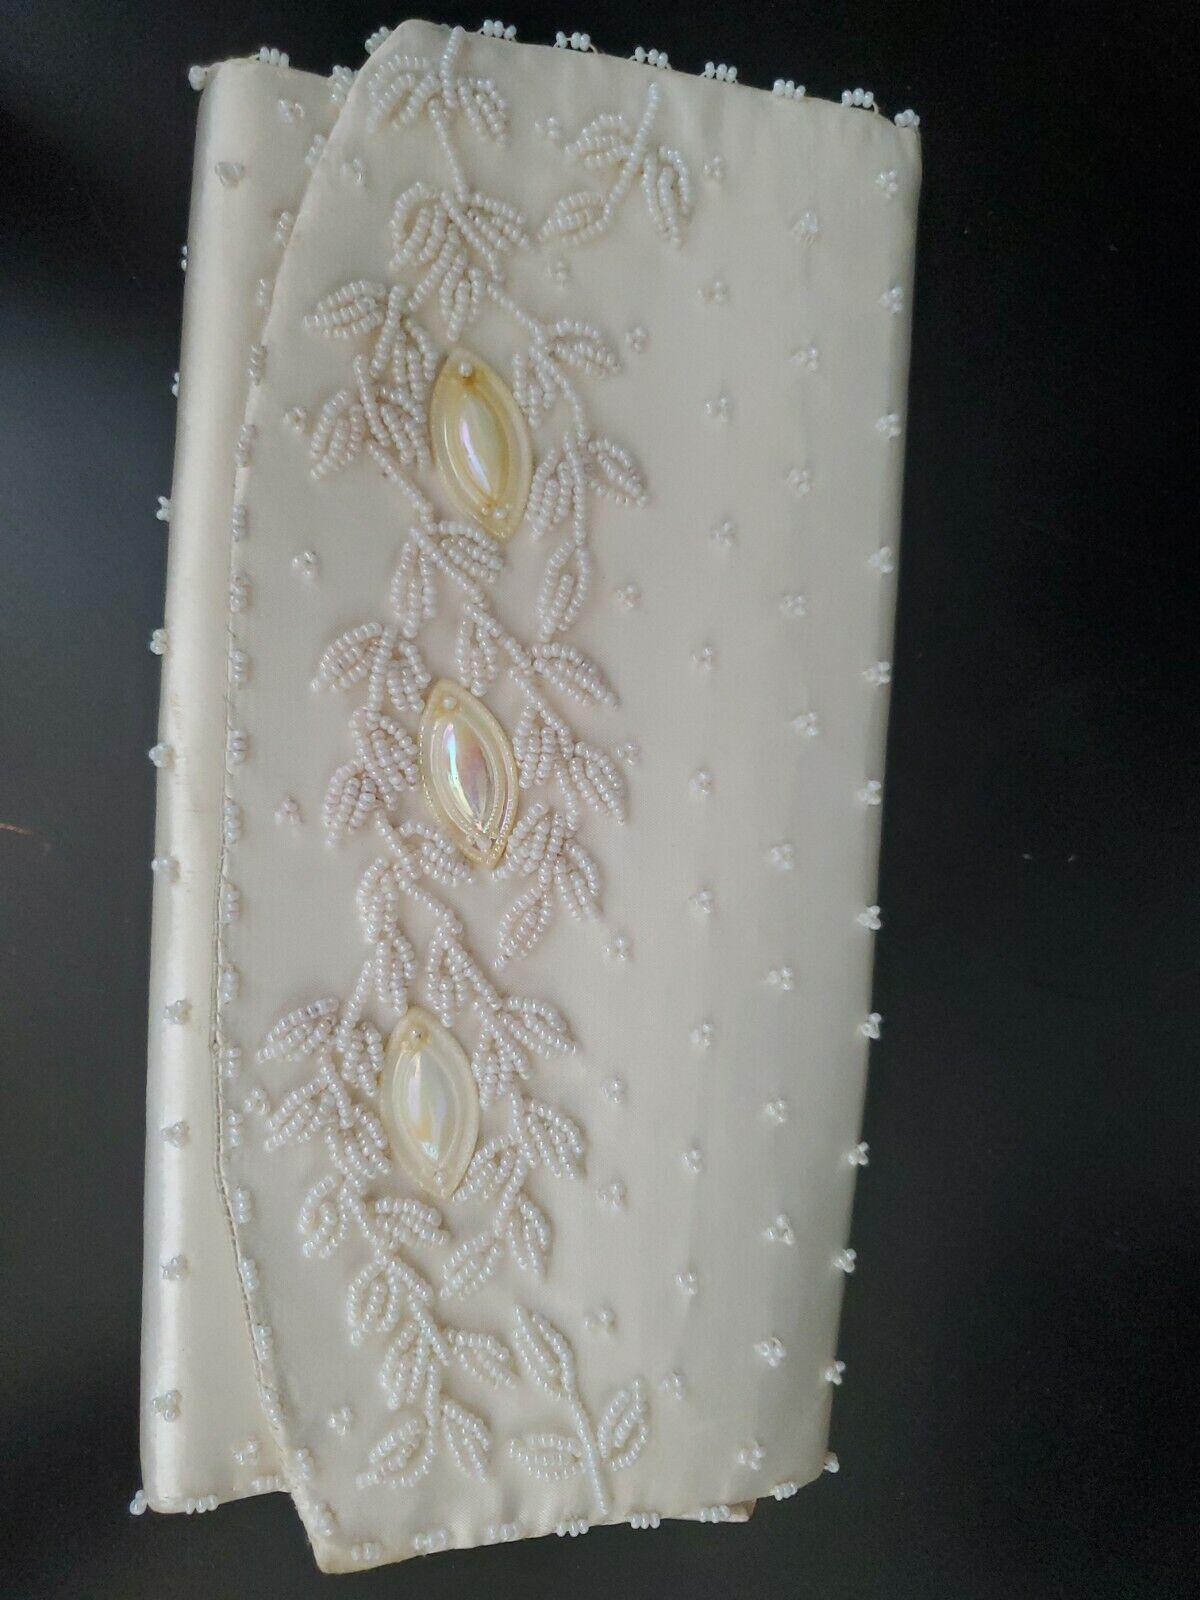 Vintage Beaded Clutch Purse 50s Hong Kong Hand Bag White Beads GUC